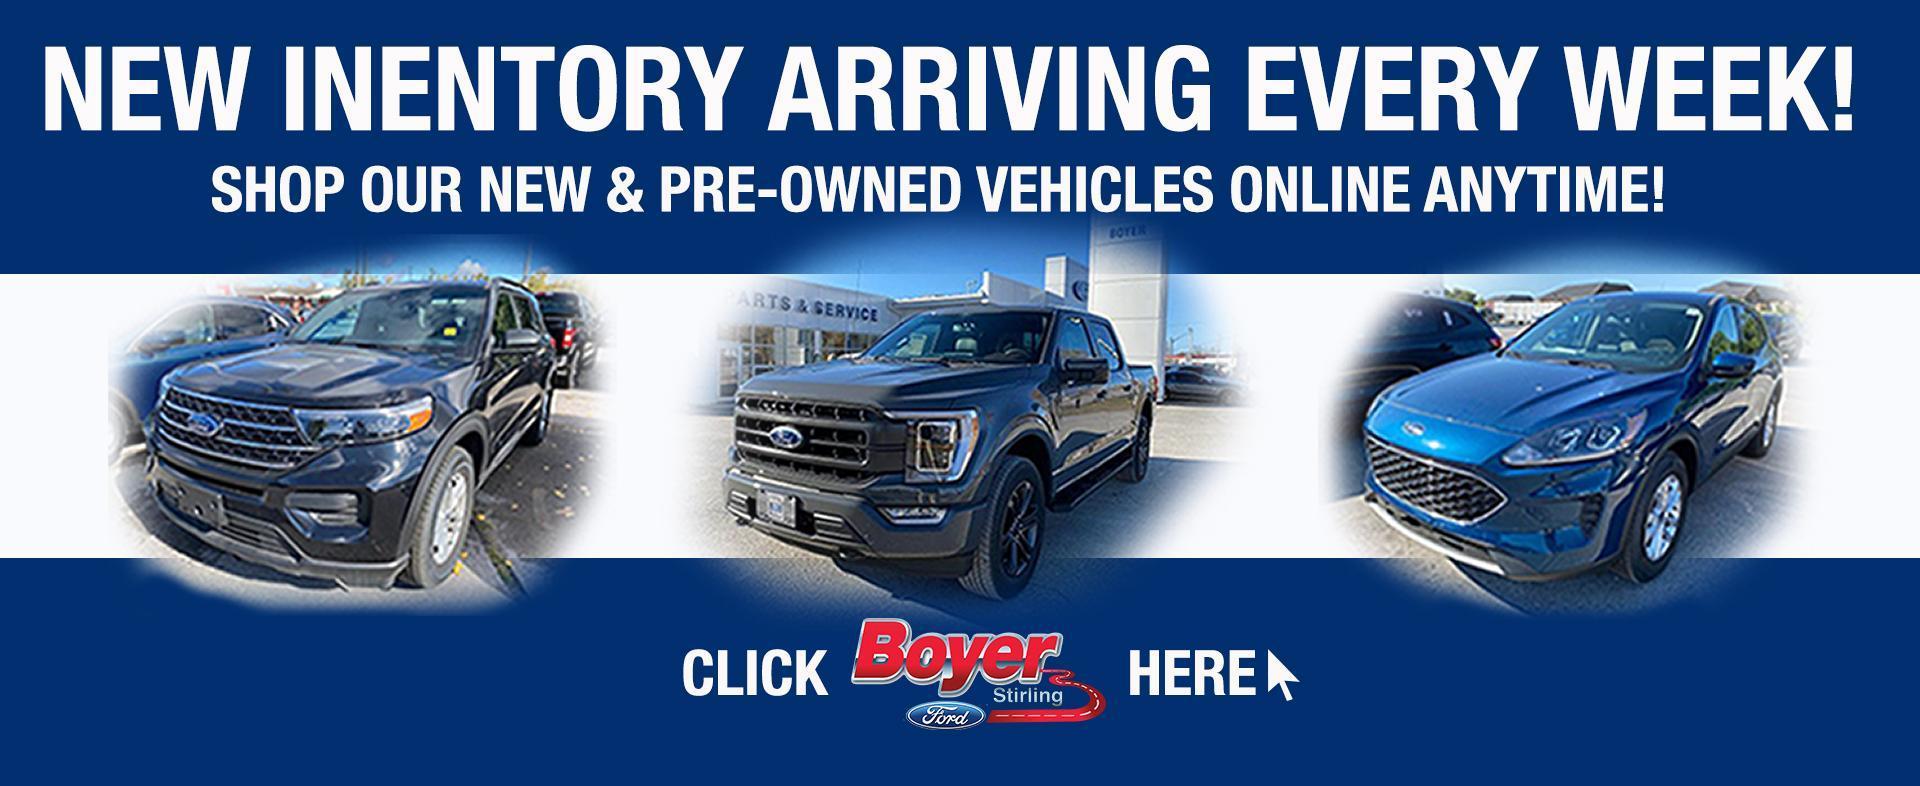 Shop Online anytime at Boyer Ford Stirling